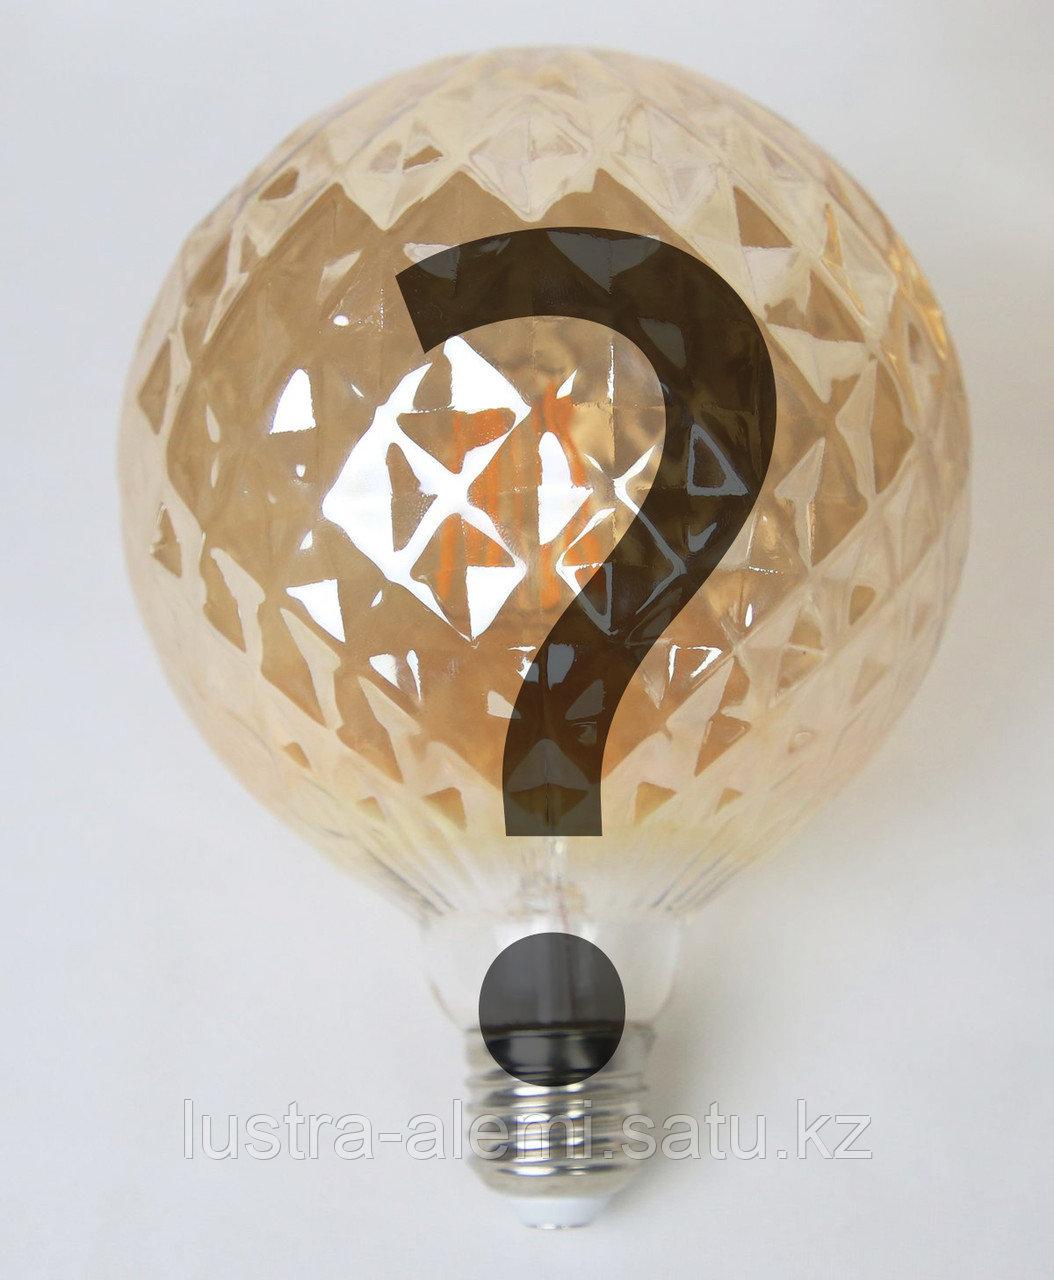 Лампа Хороз RUSTIC GLOBE 4вт  E27